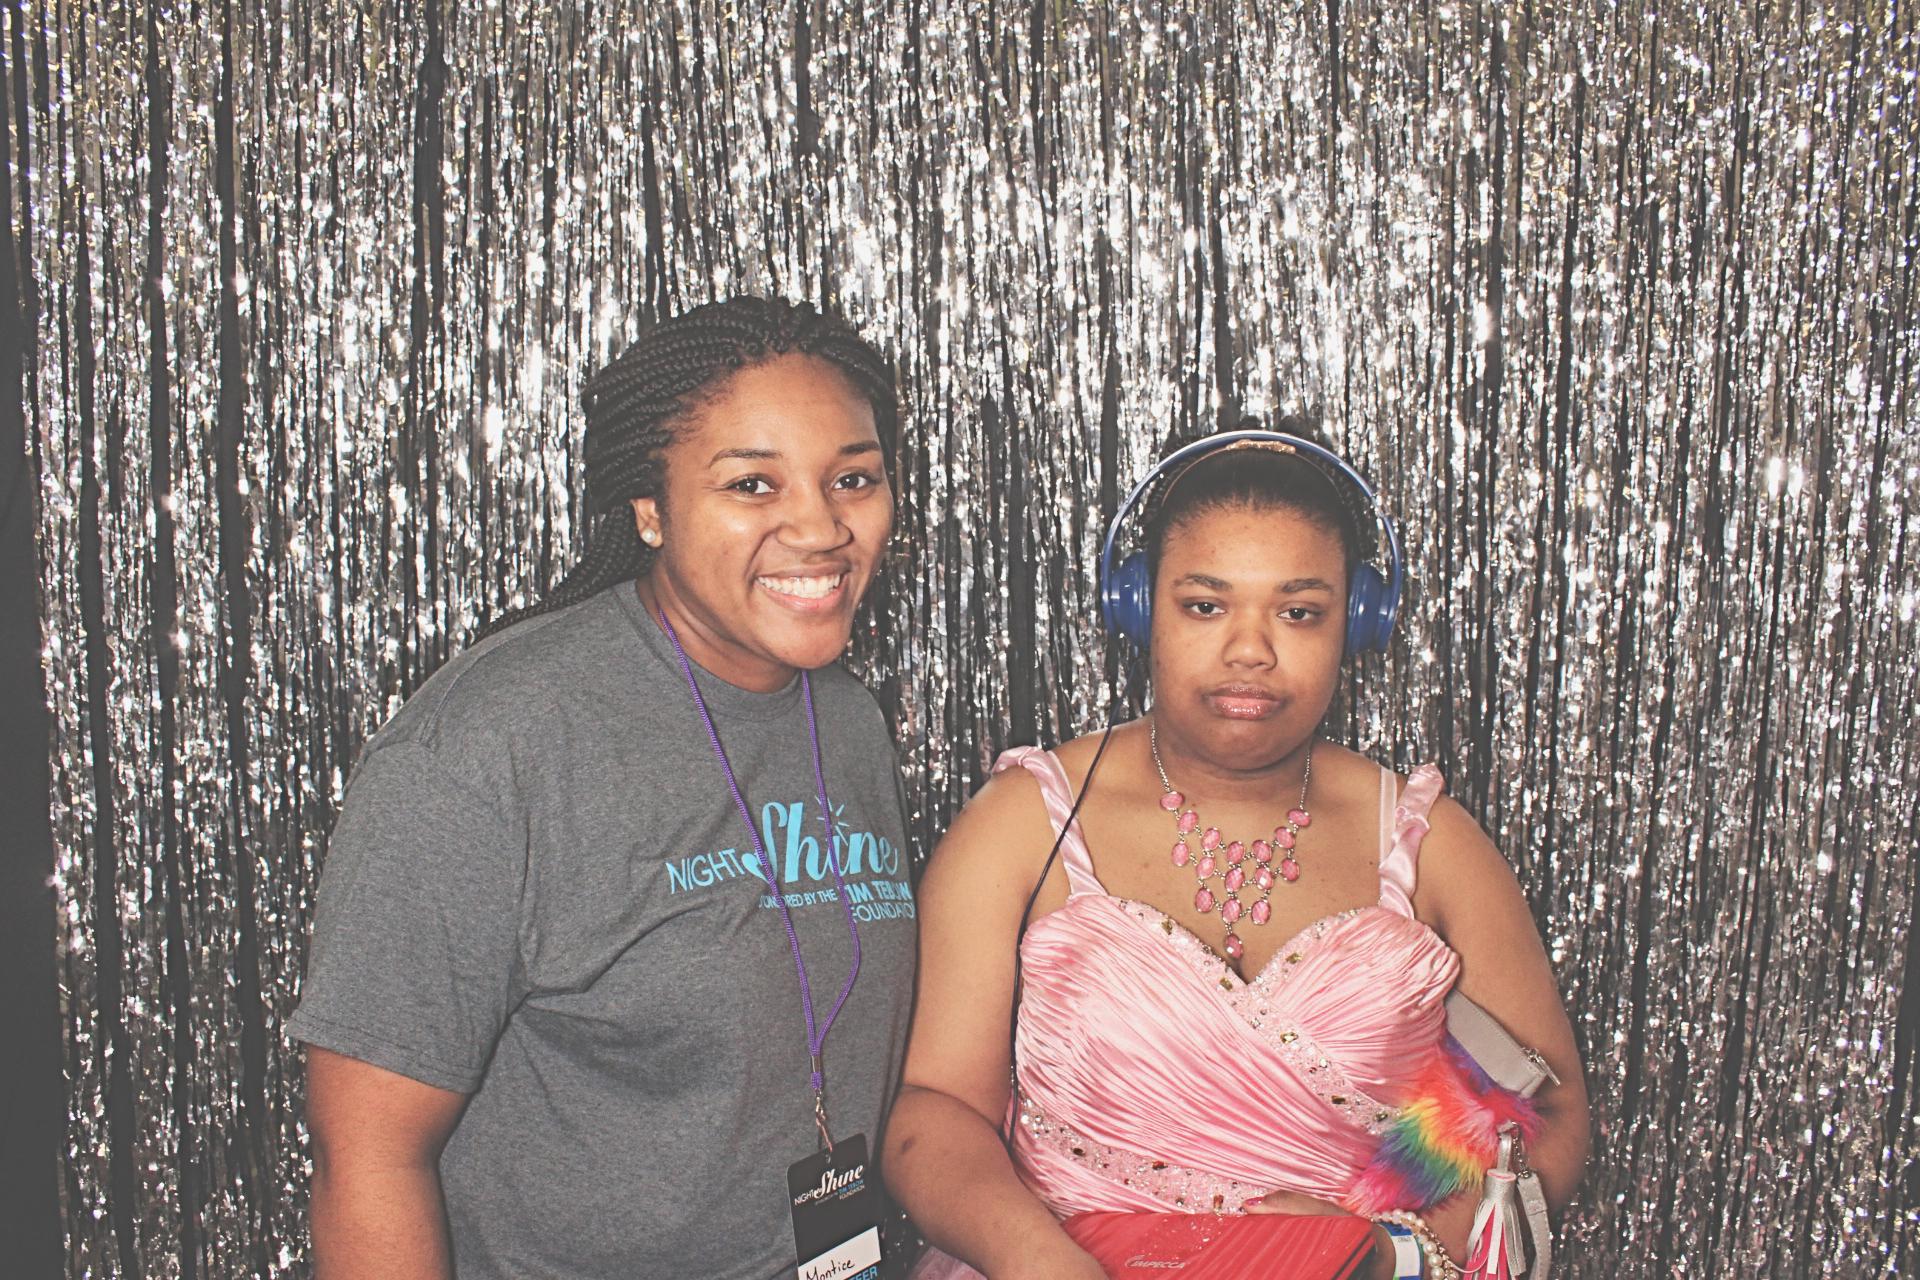 2-8-19 Atlanta Southcrest Church Photo Booth - Night to Shine Coweta 2019 - Robot Booth244.jpg